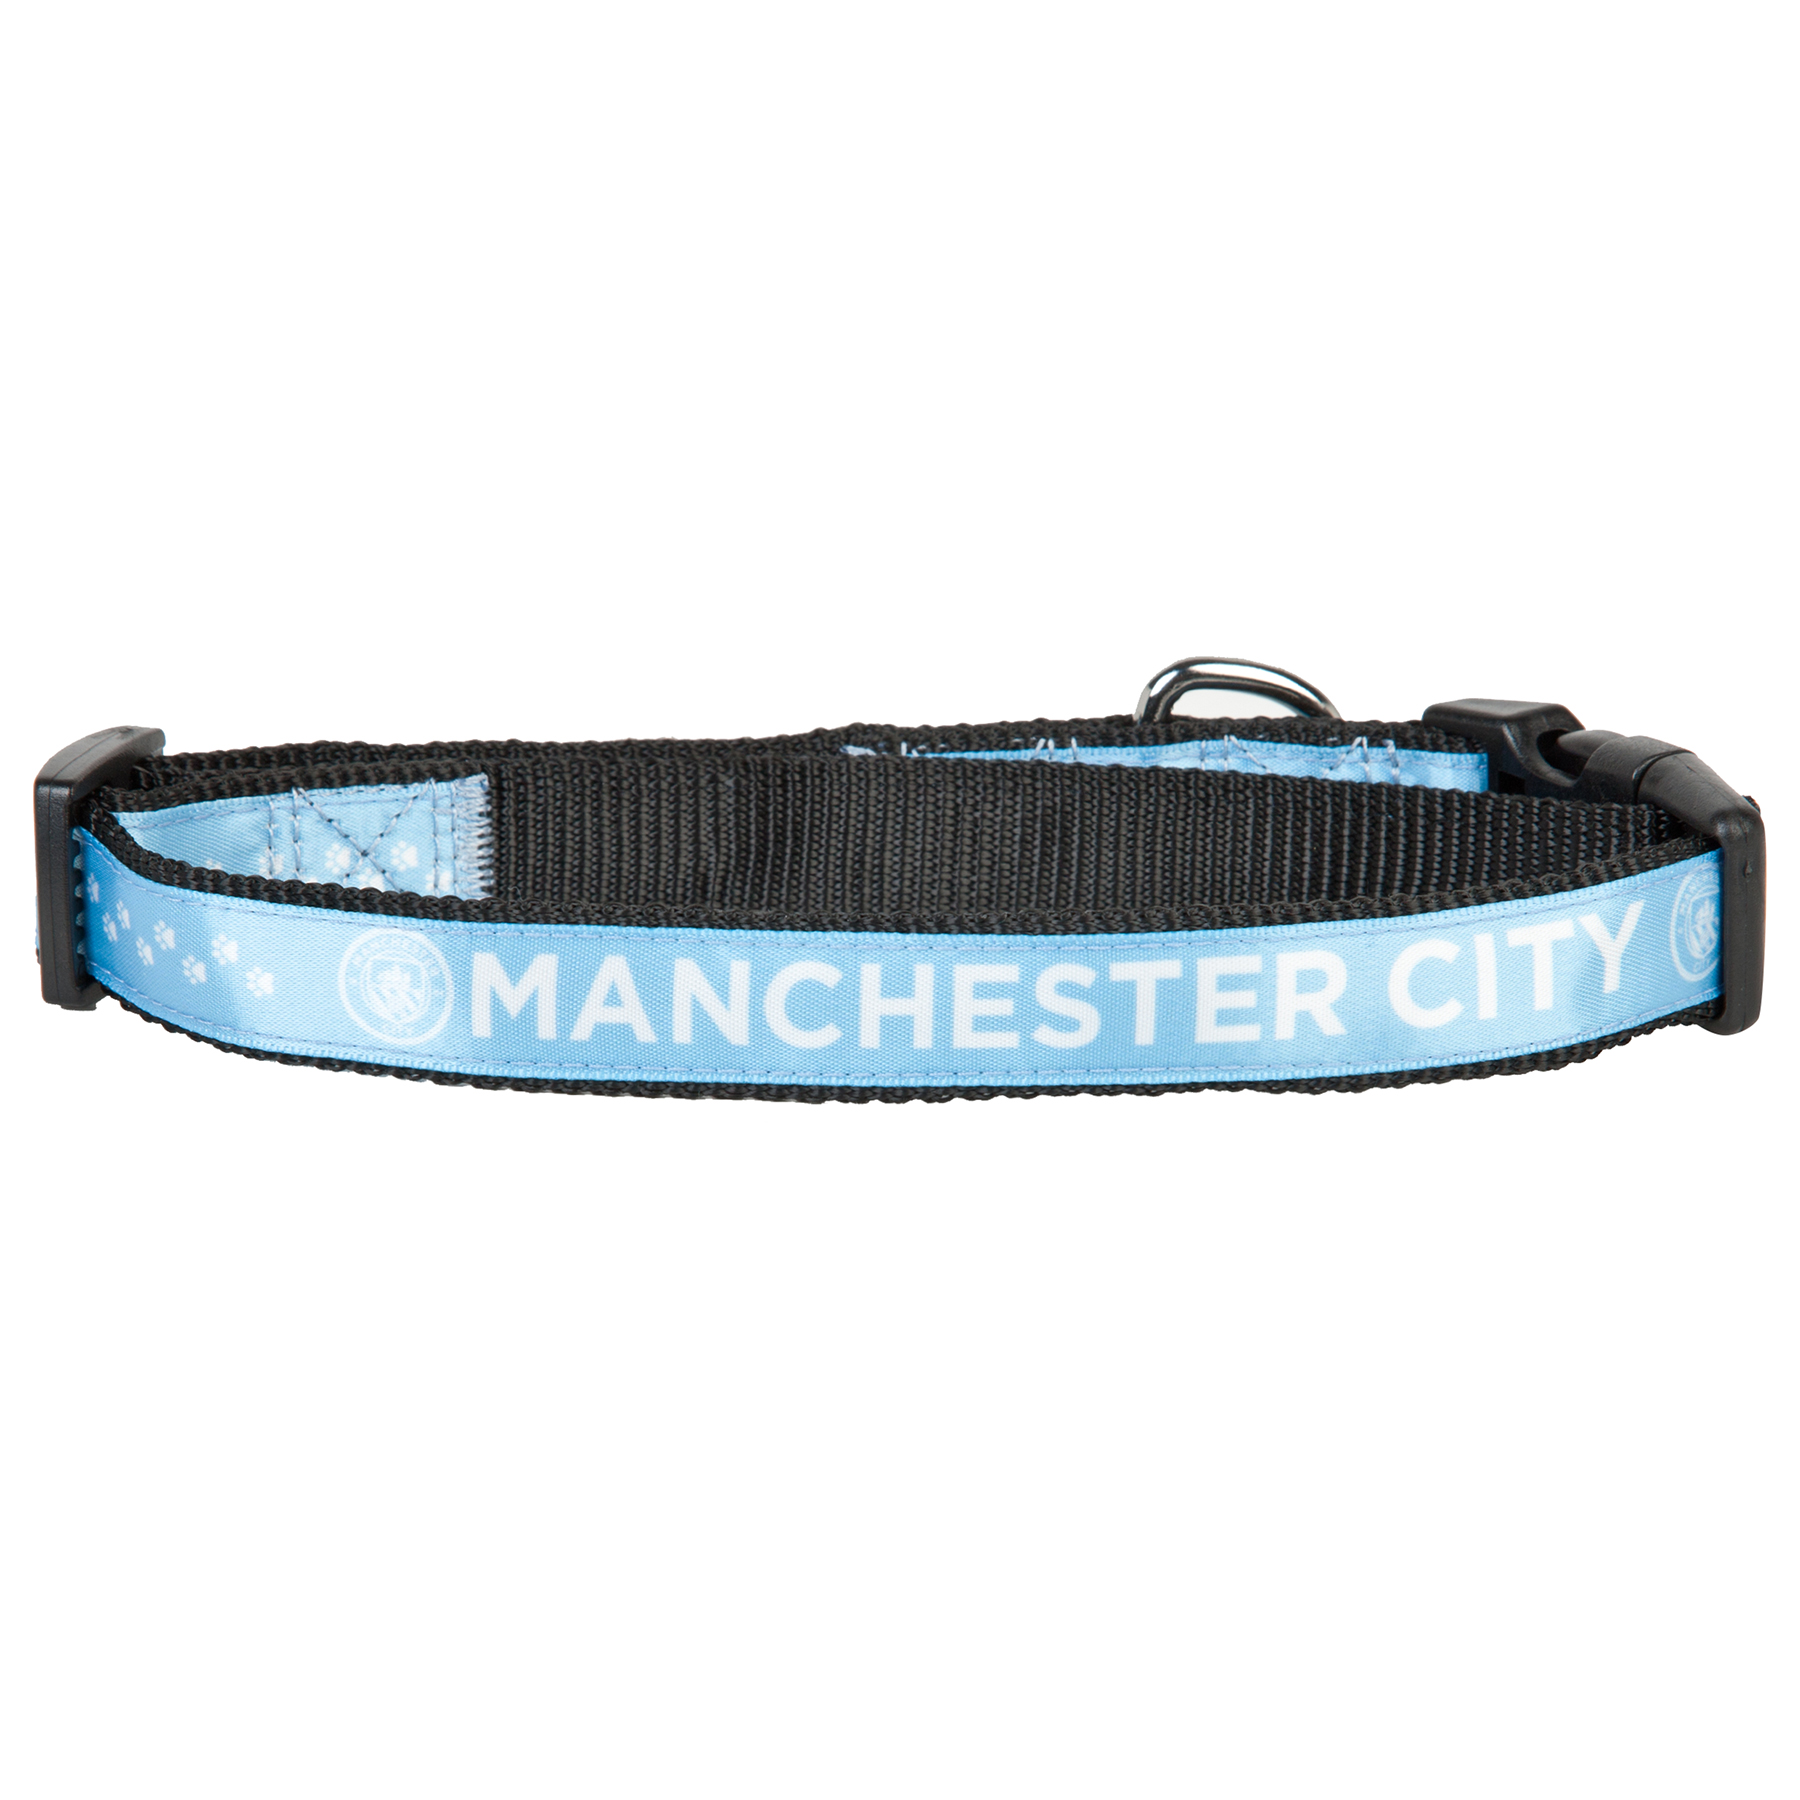 Manchester City Dog Collar - Small